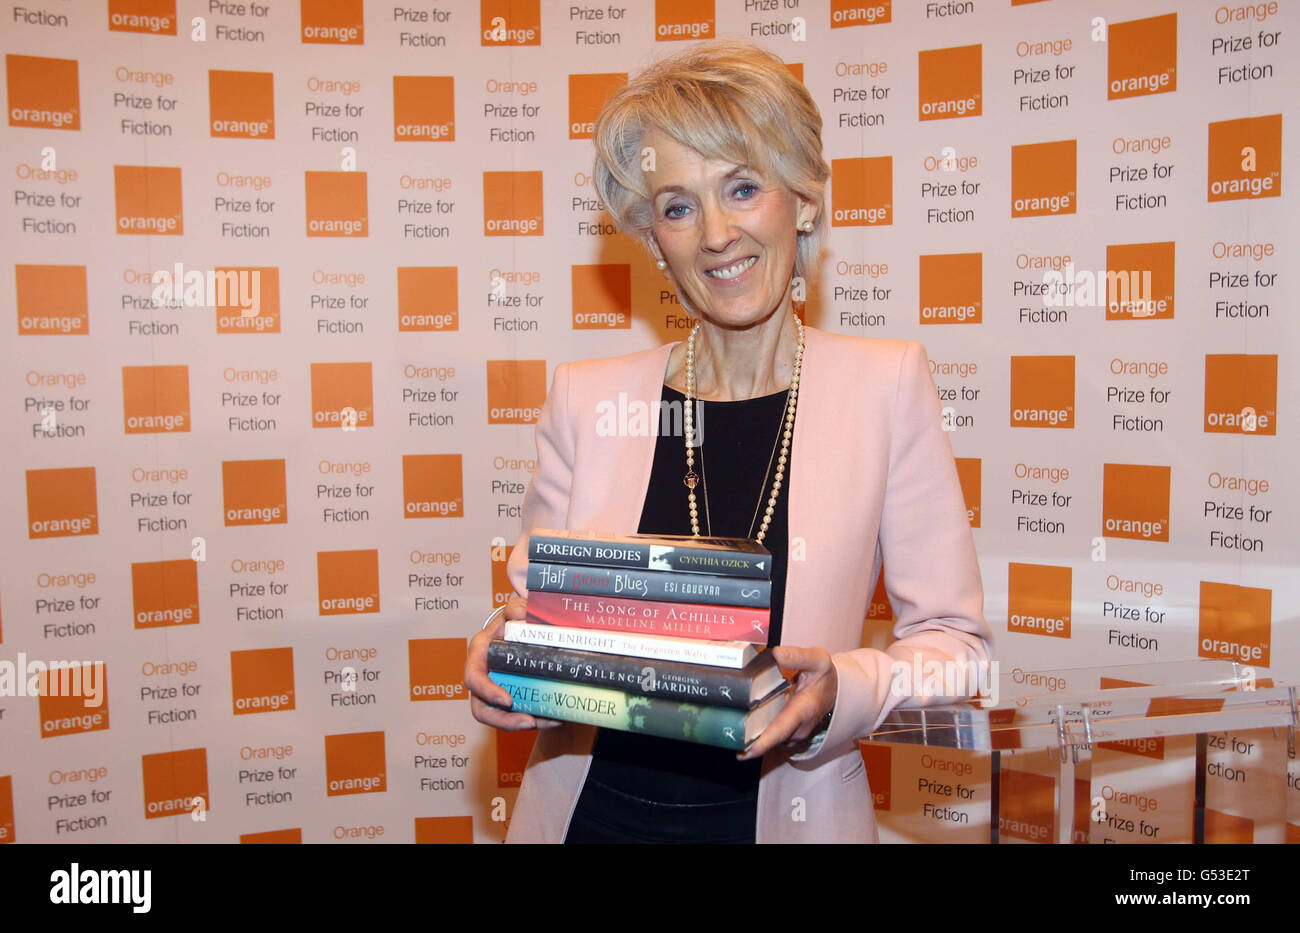 Orange Prize for Fiction - Stock Image